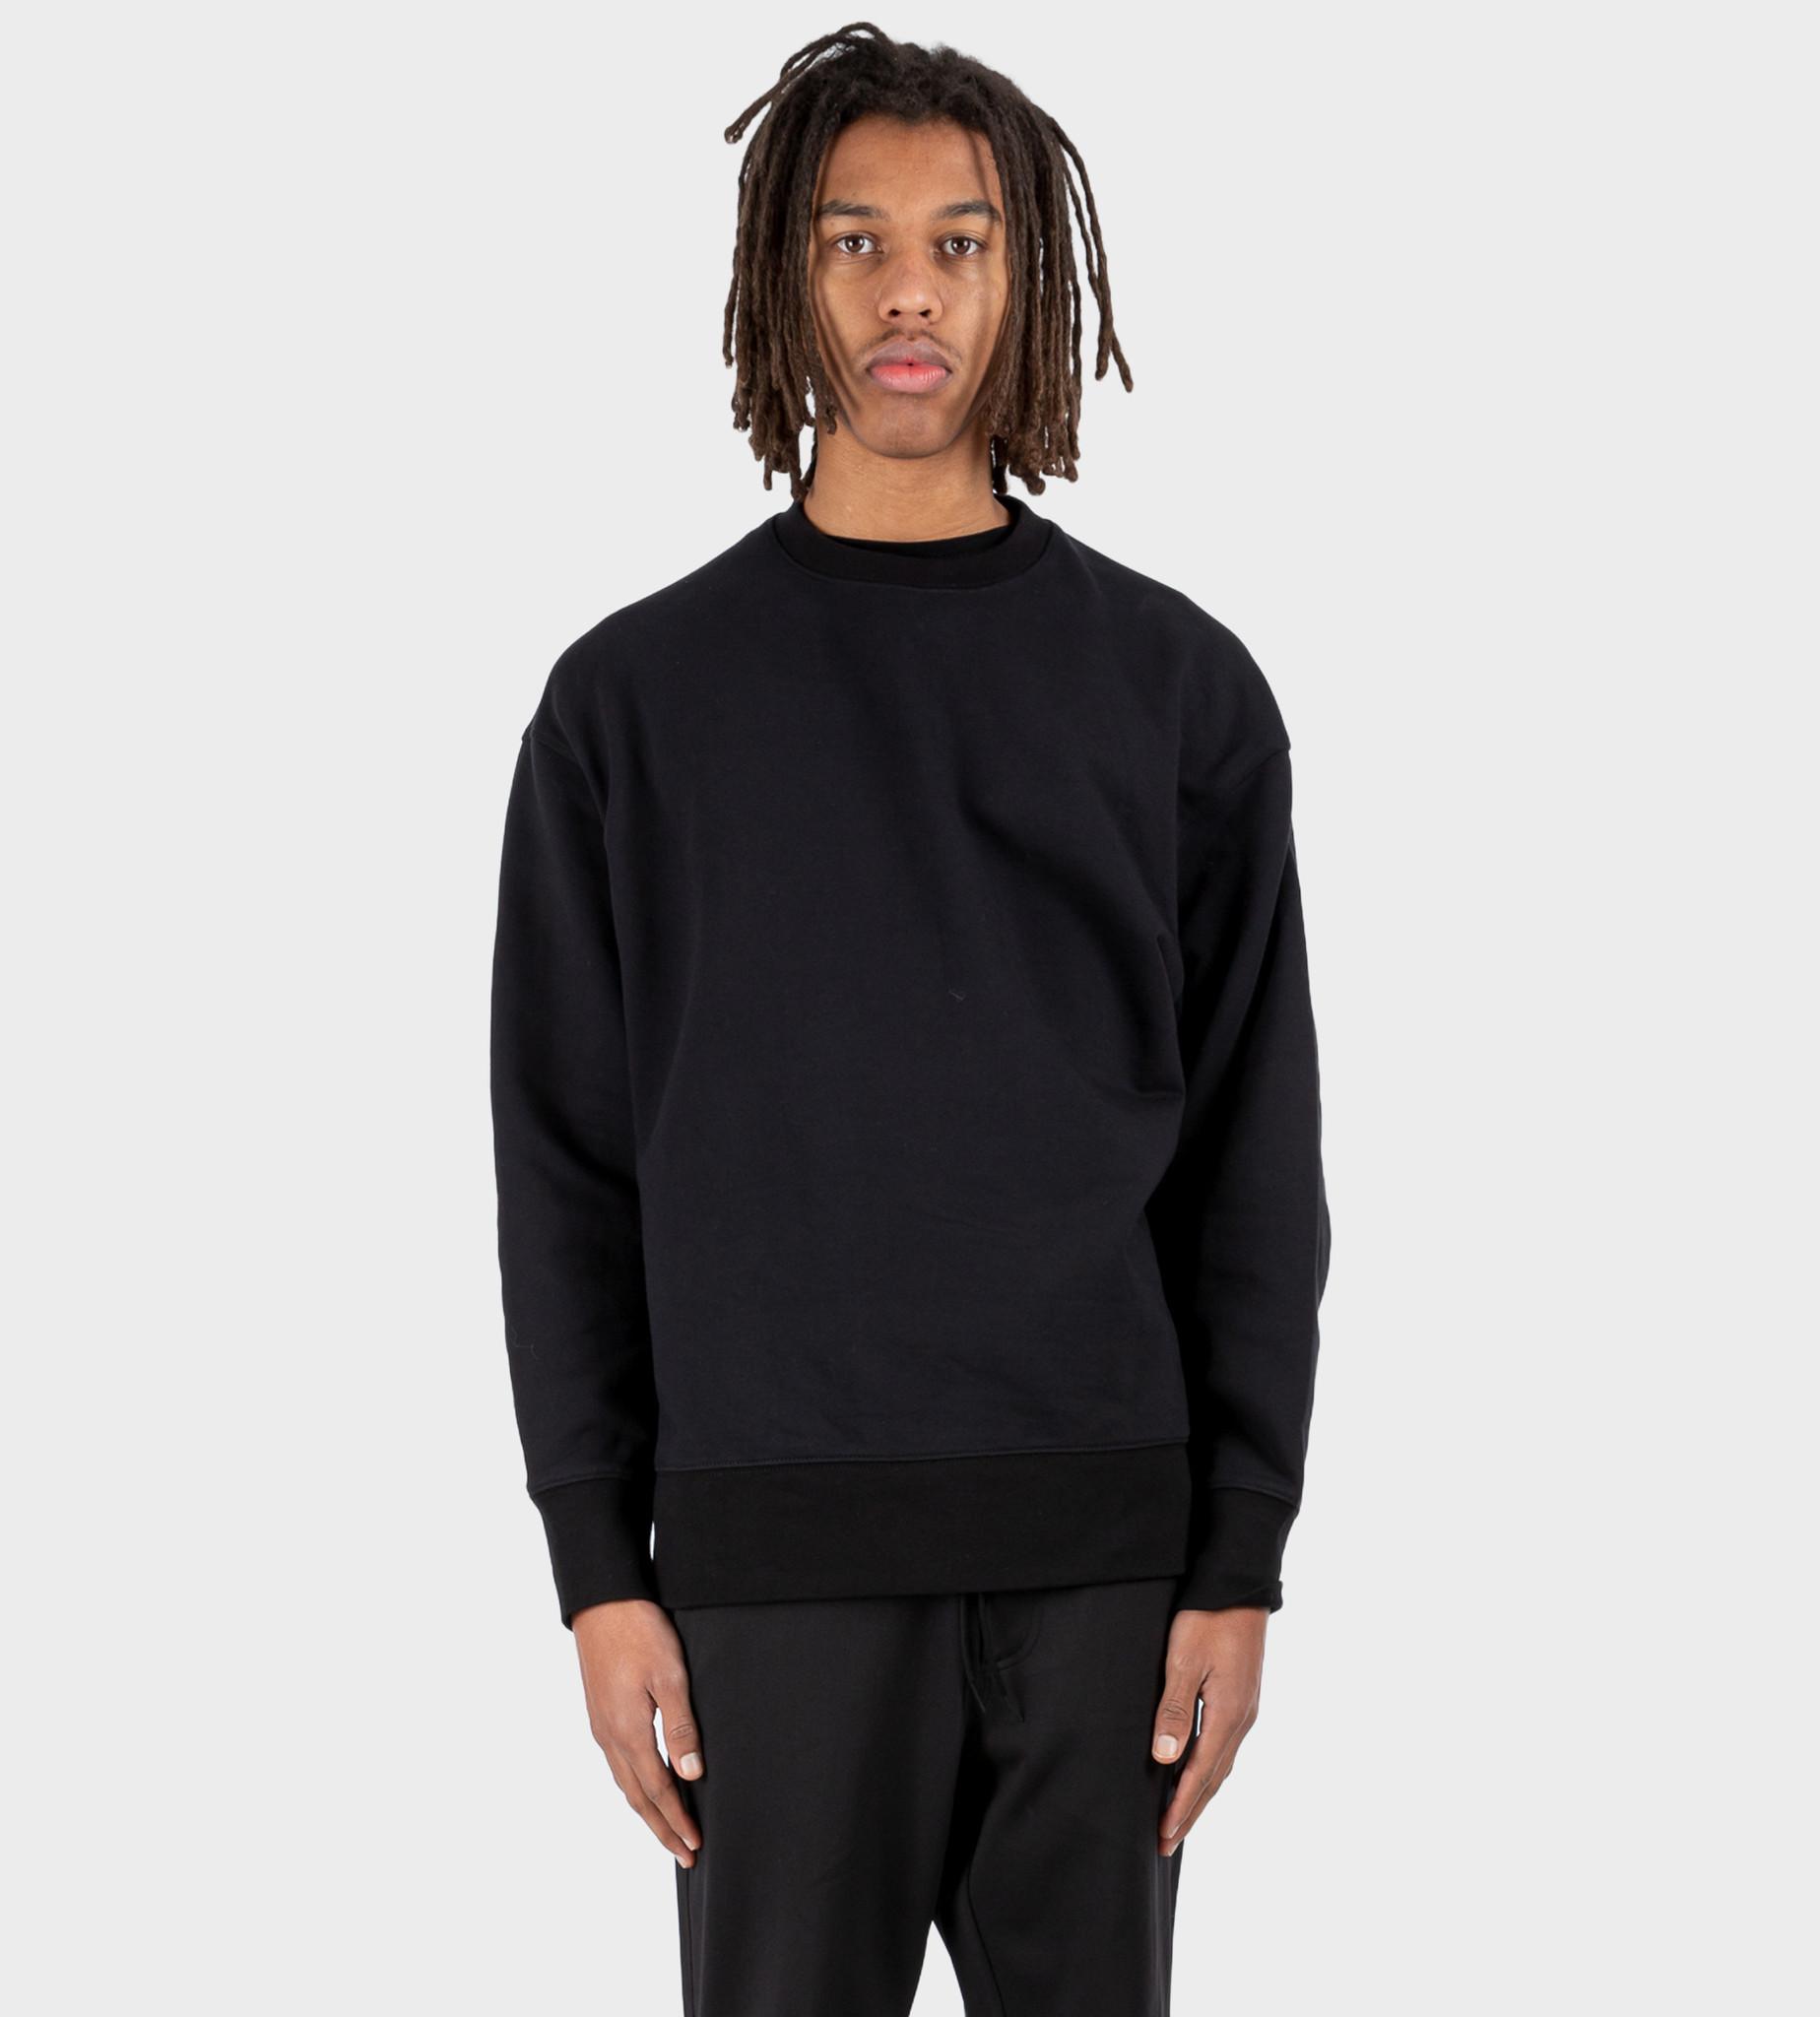 Y3 Stripes Terry Crew Sweatshirt Black